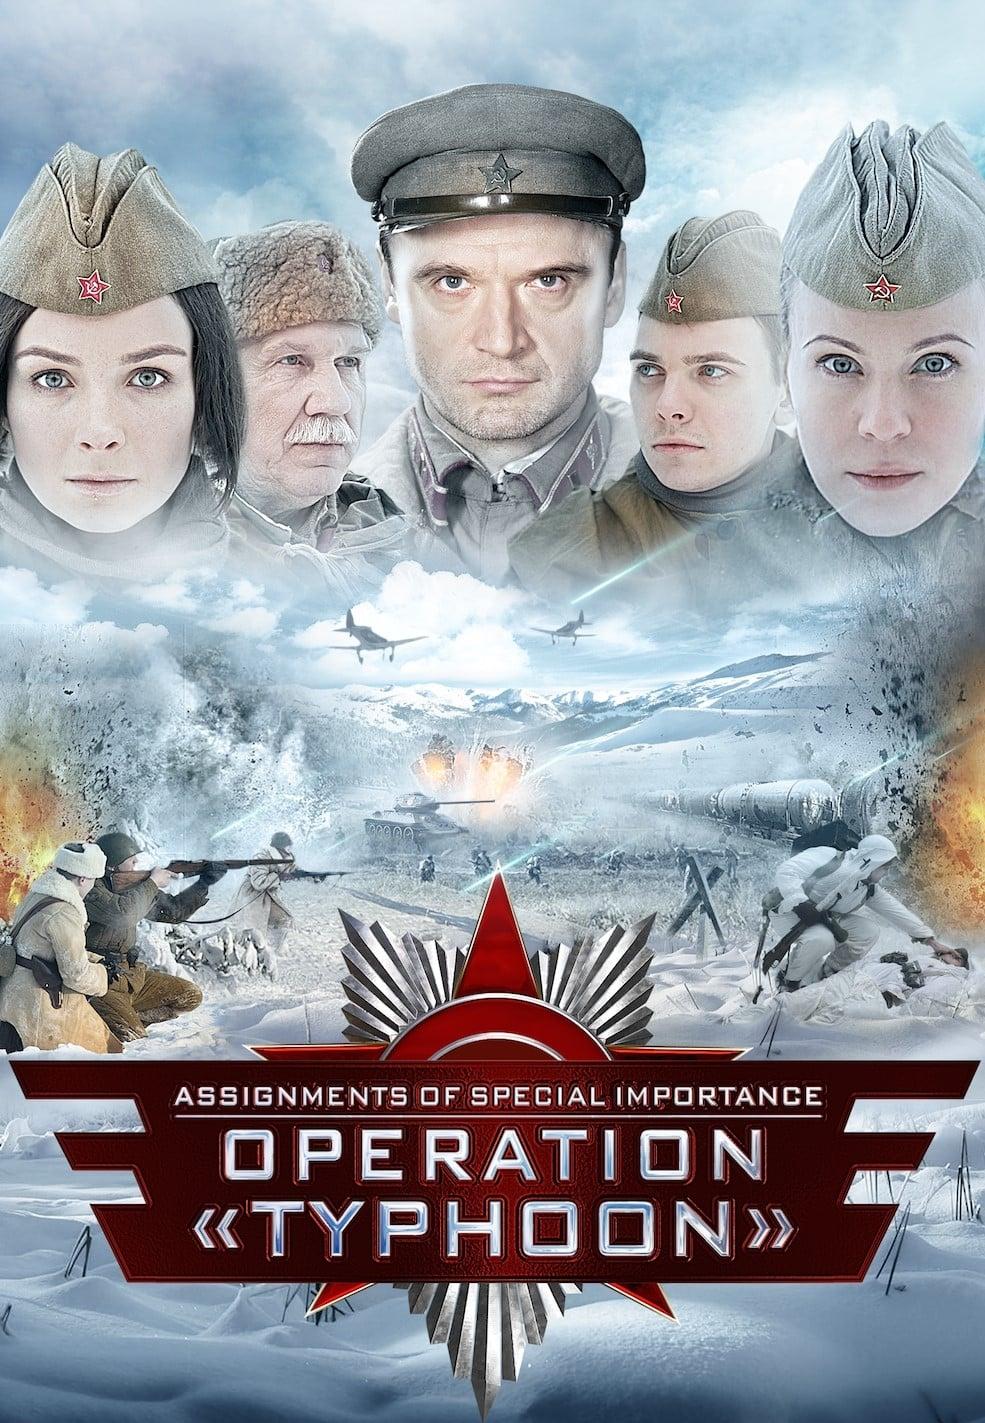 Opération Typhon